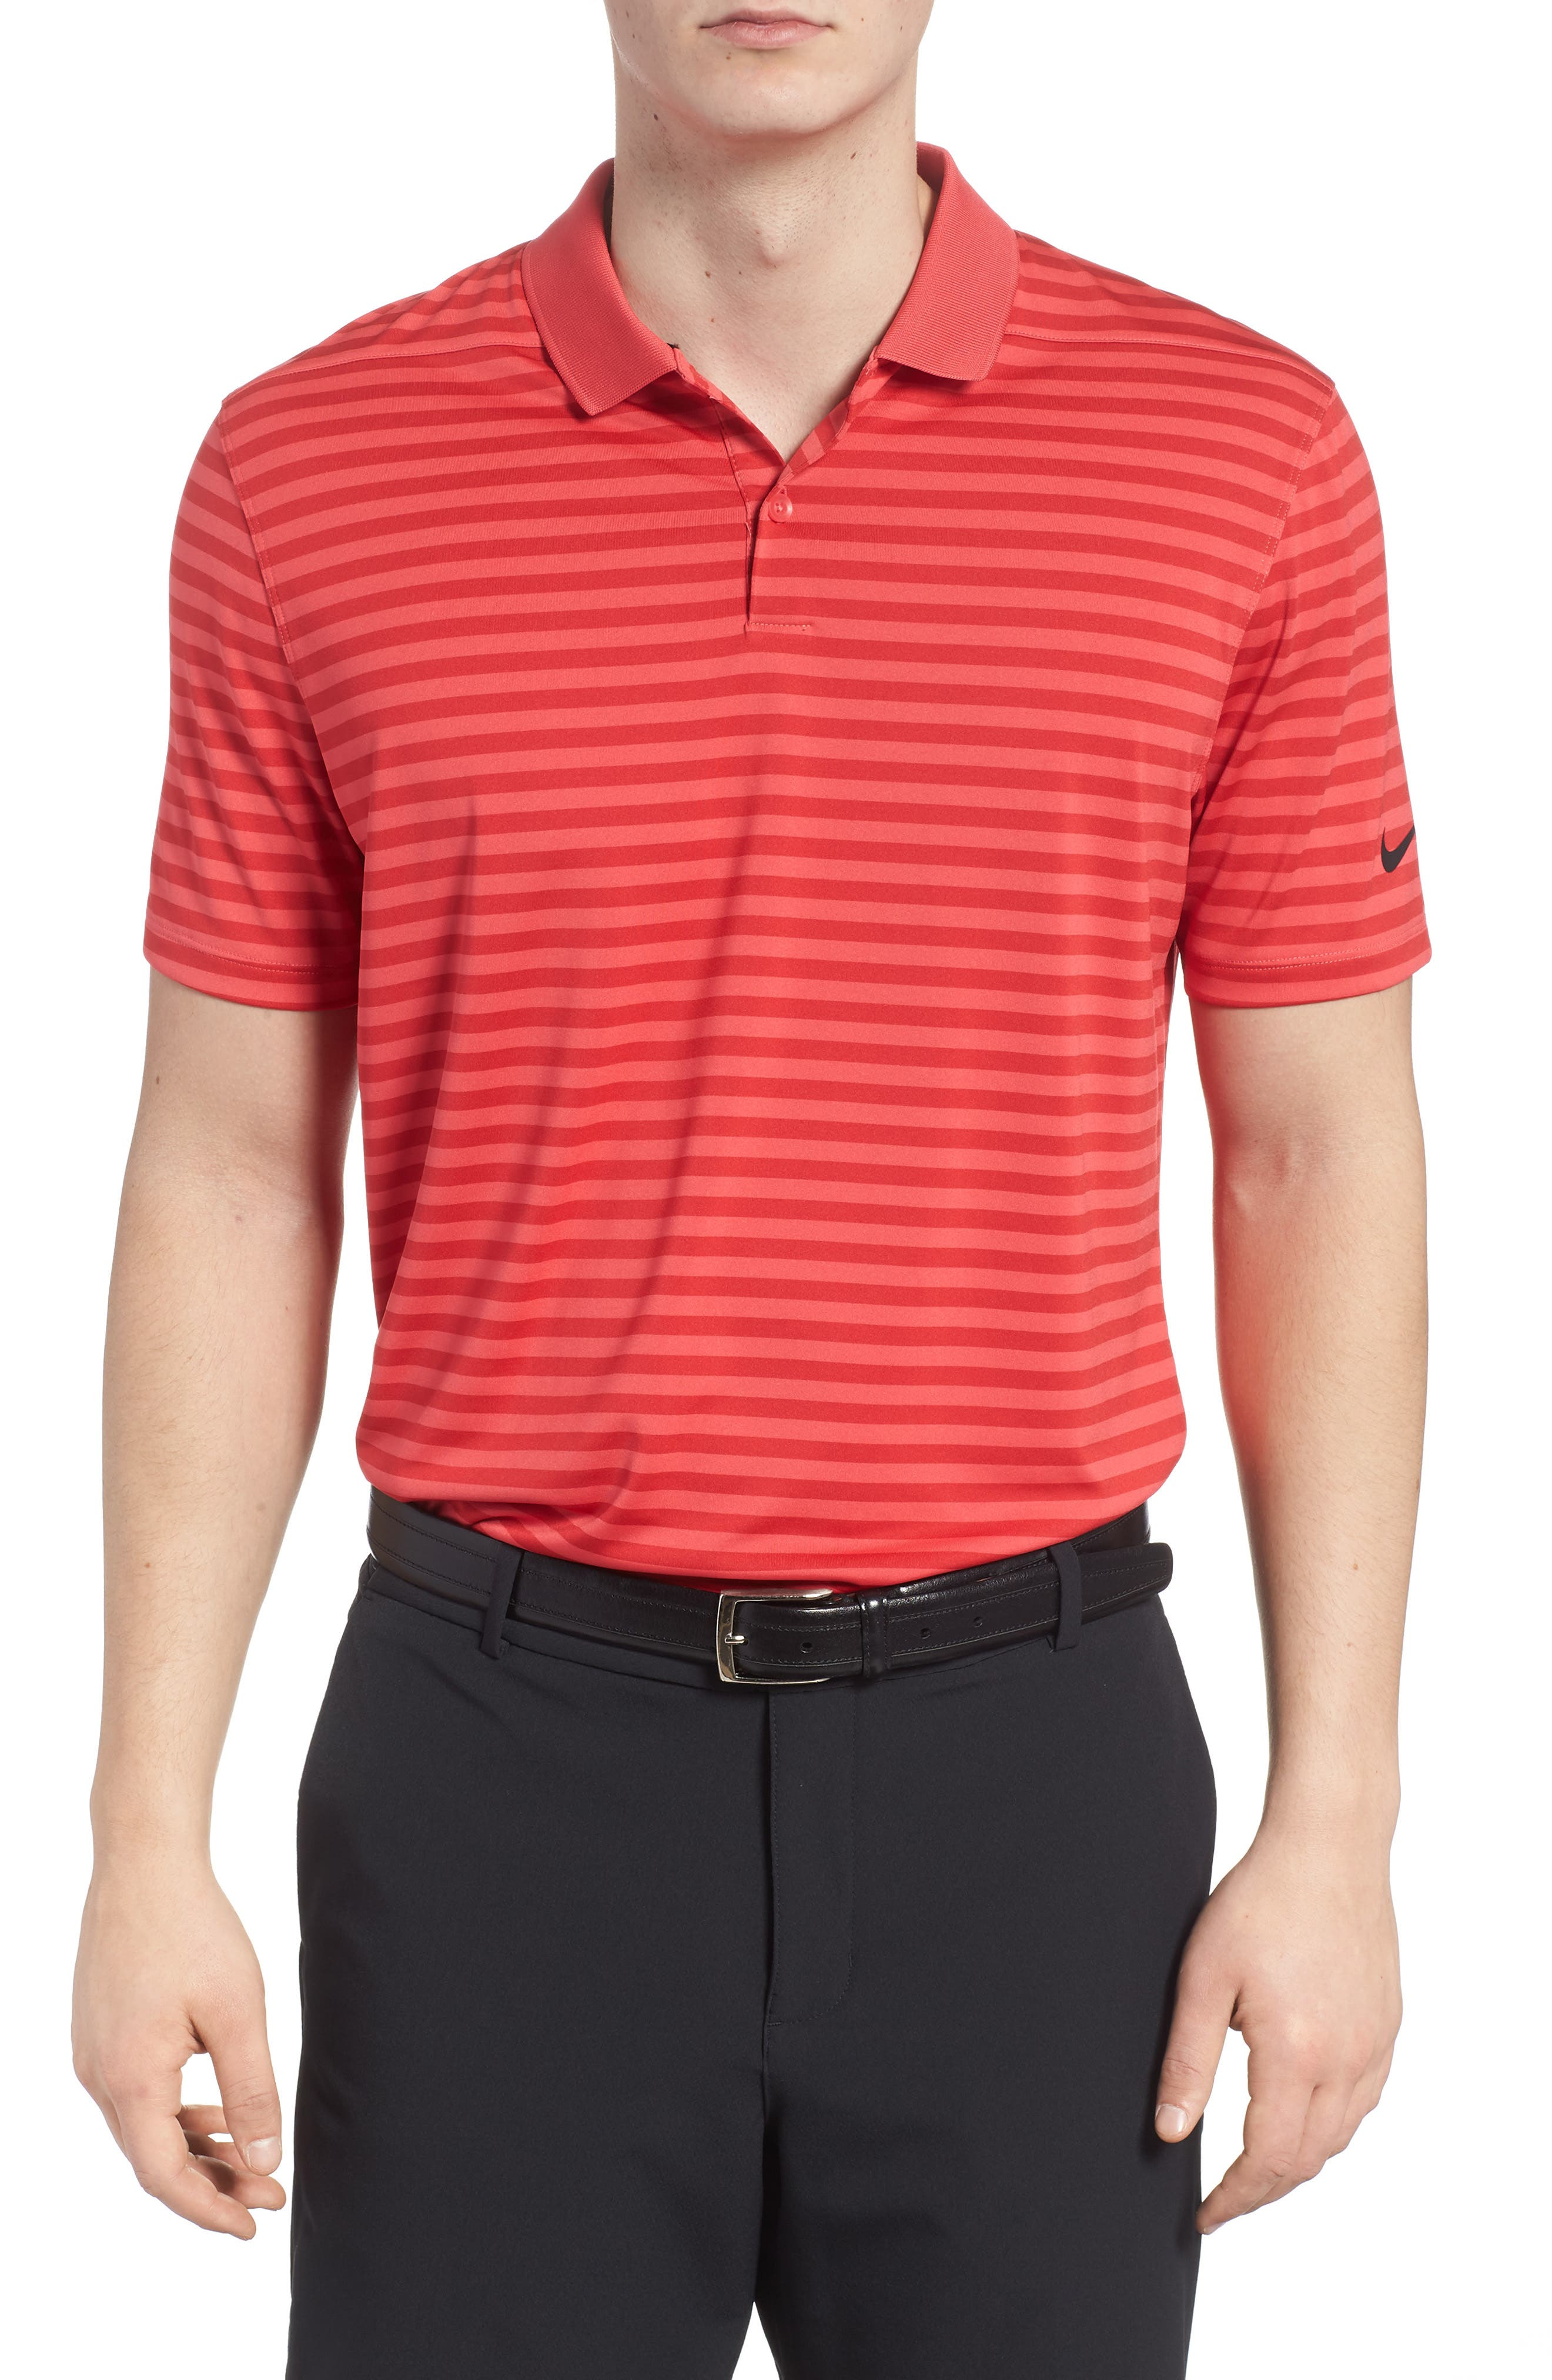 Nike Dry Victory Stripe Golf Polo